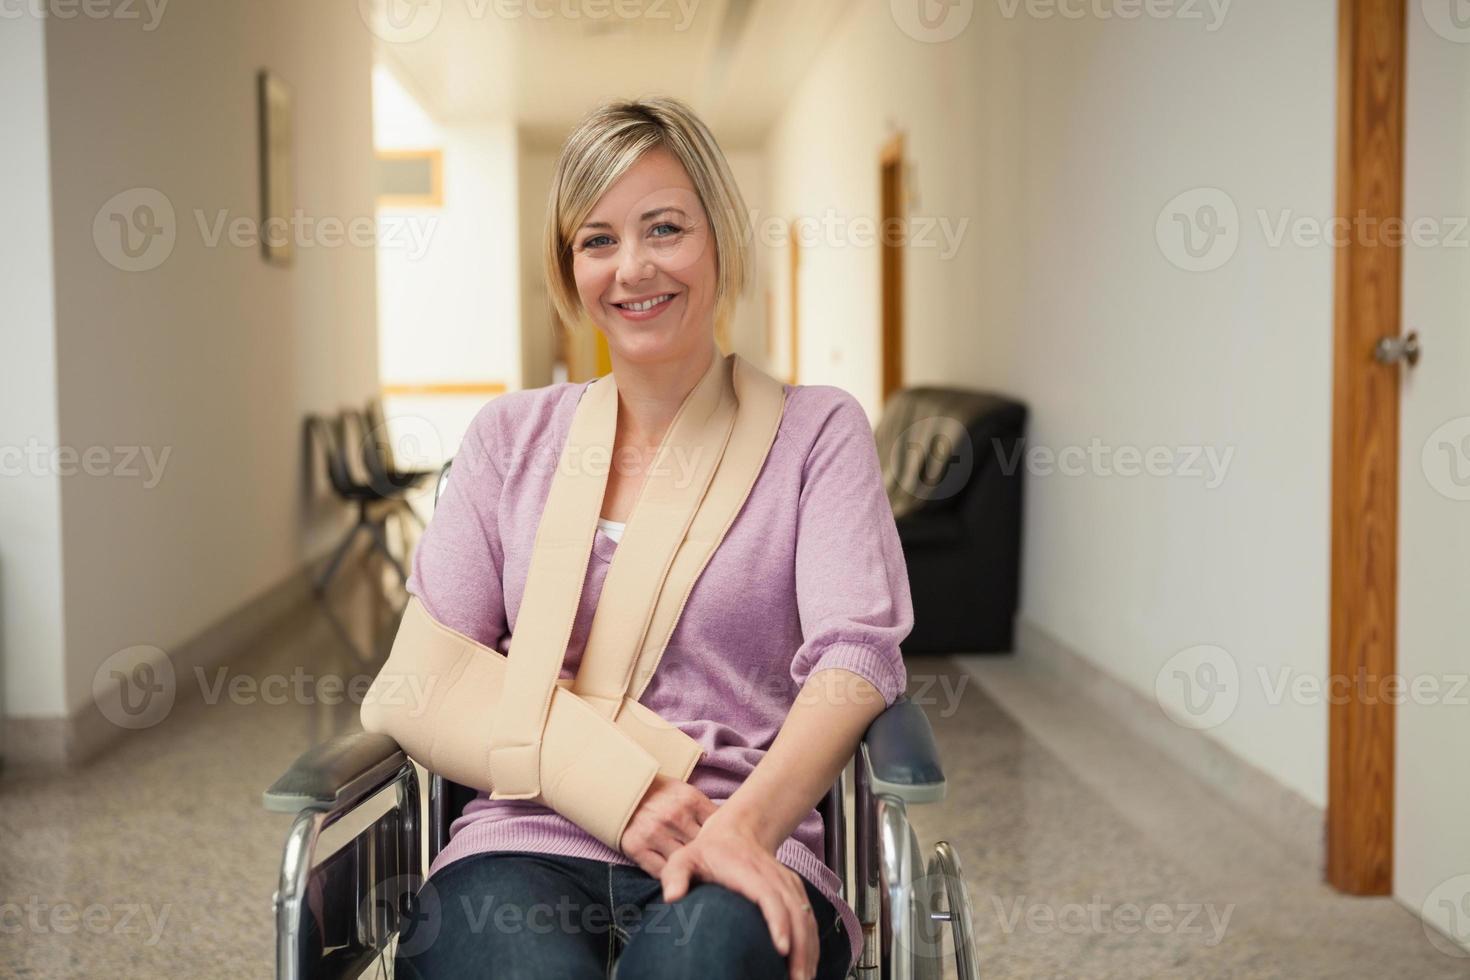 Patient in wheelchair with broken arm photo